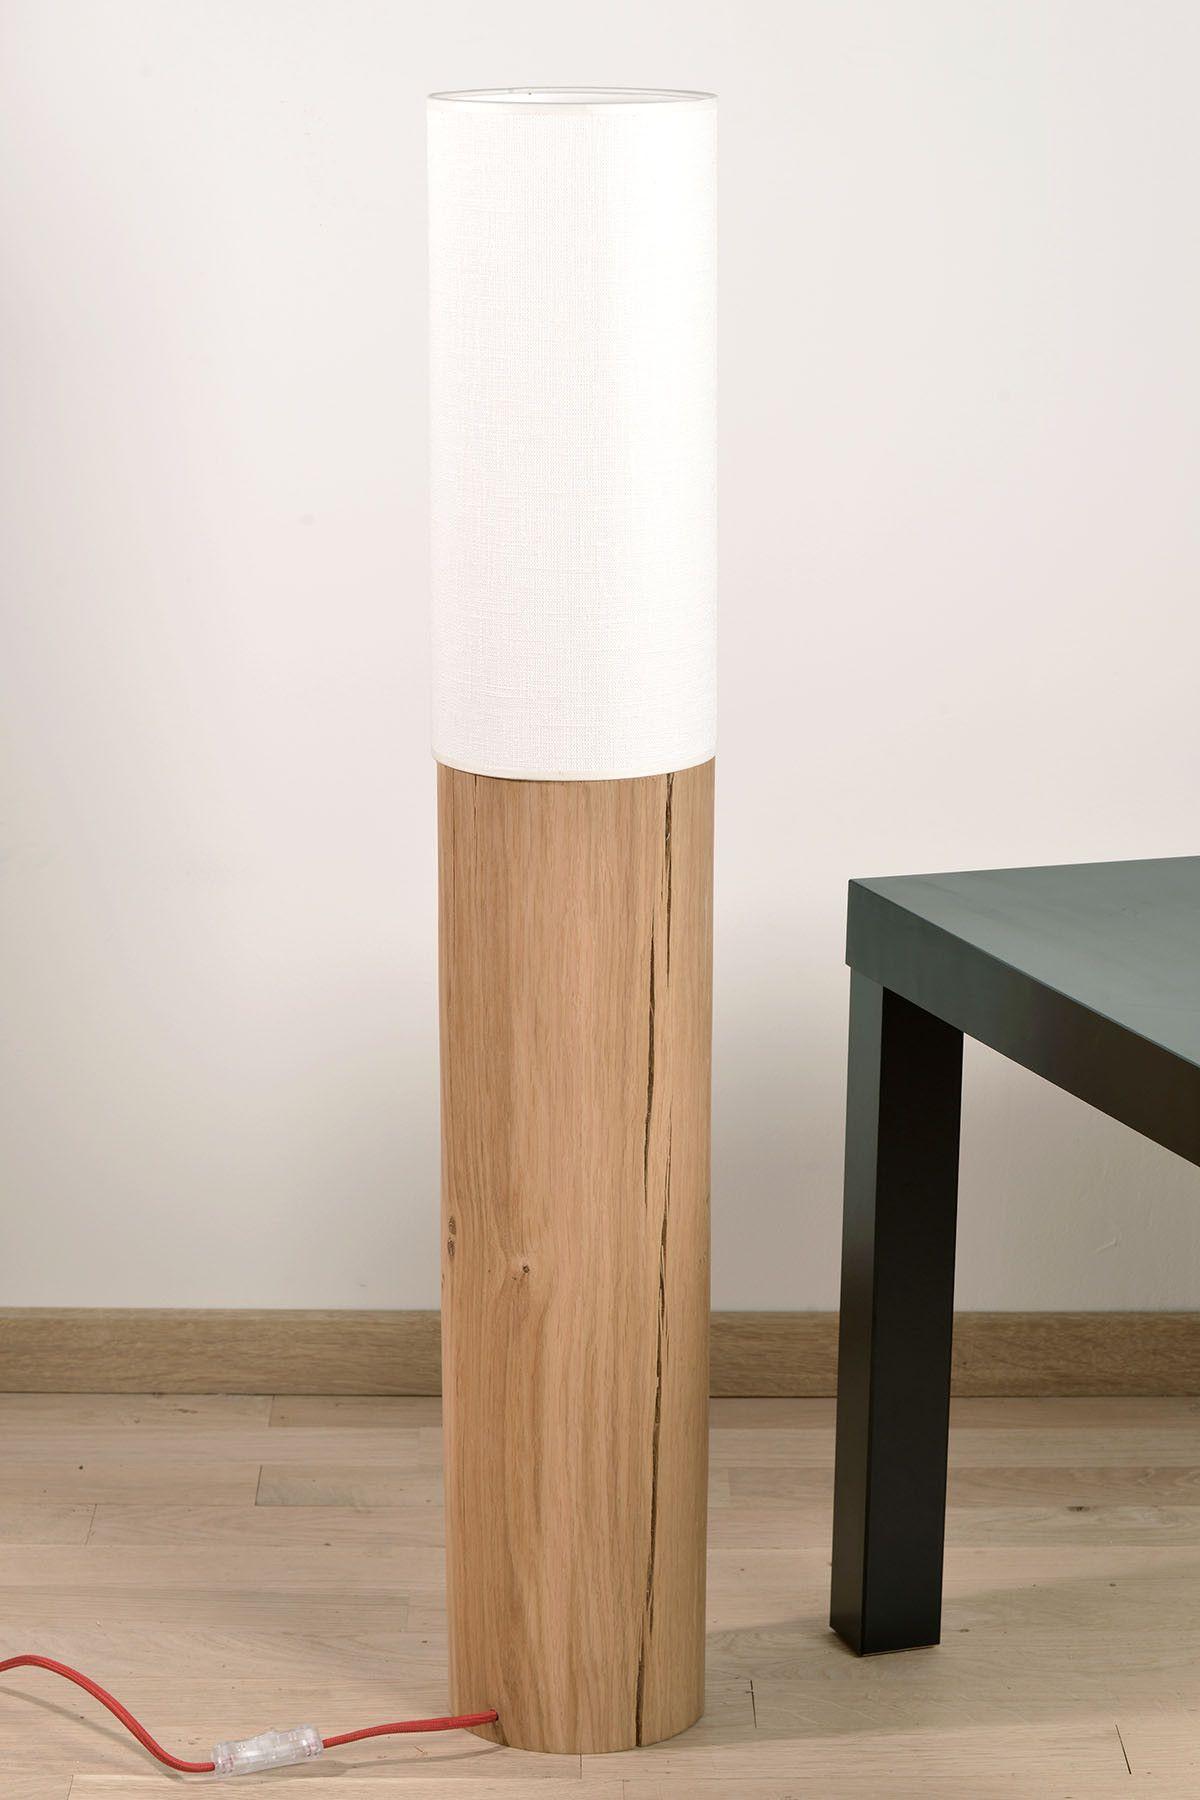 Le Industrial Design blumen sur goodmorningdesign fr cedar fever